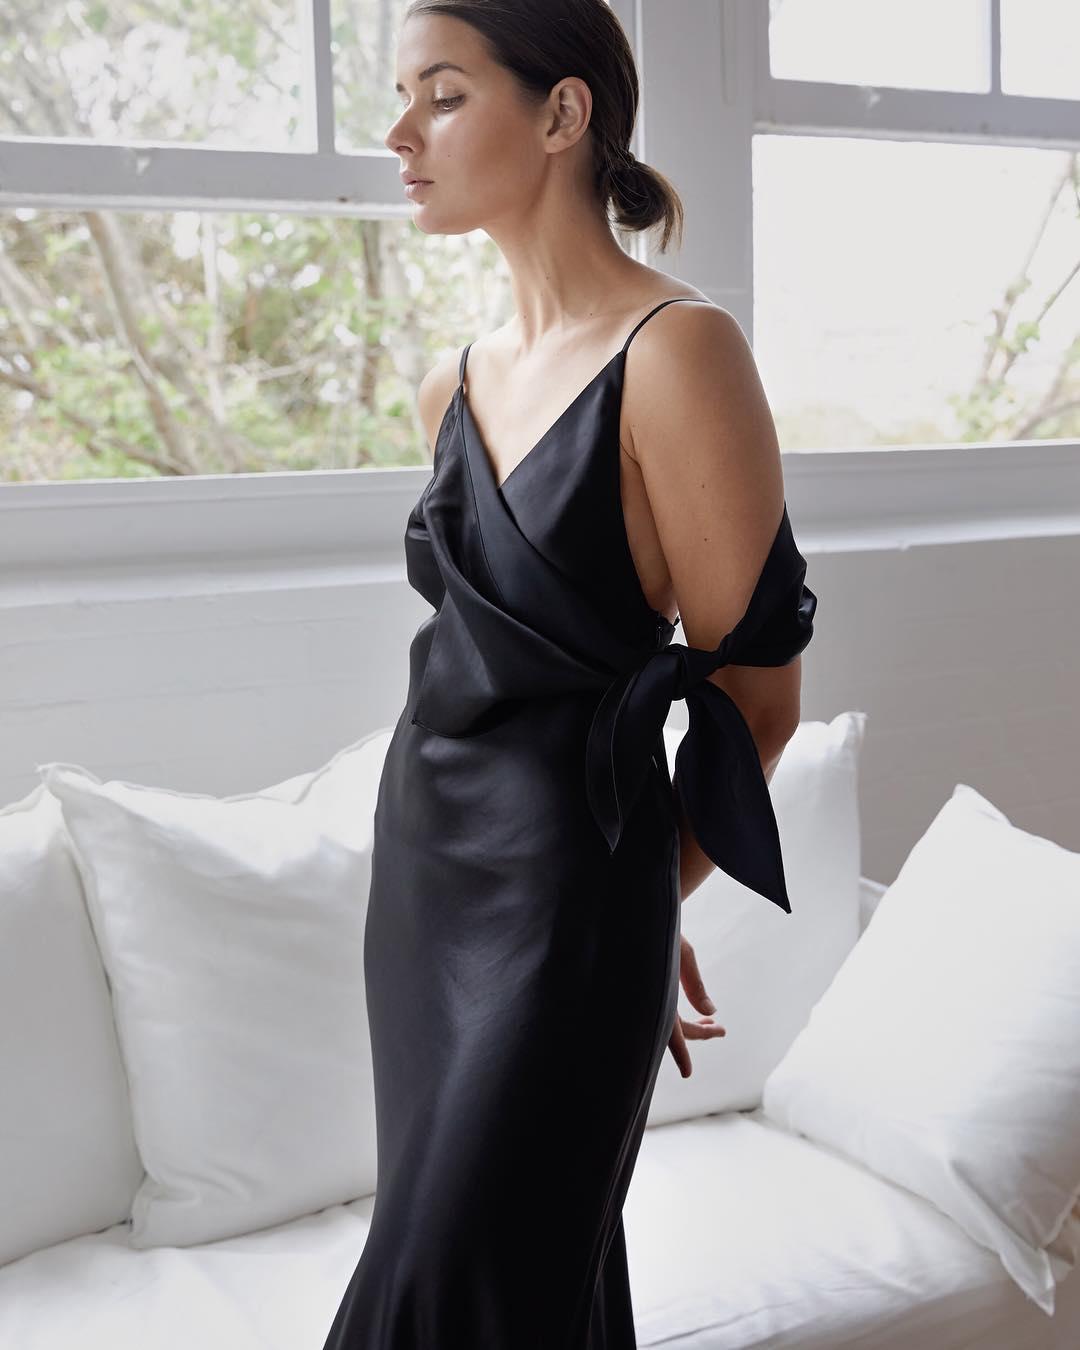 sara crampton mặc đầm đen lụa